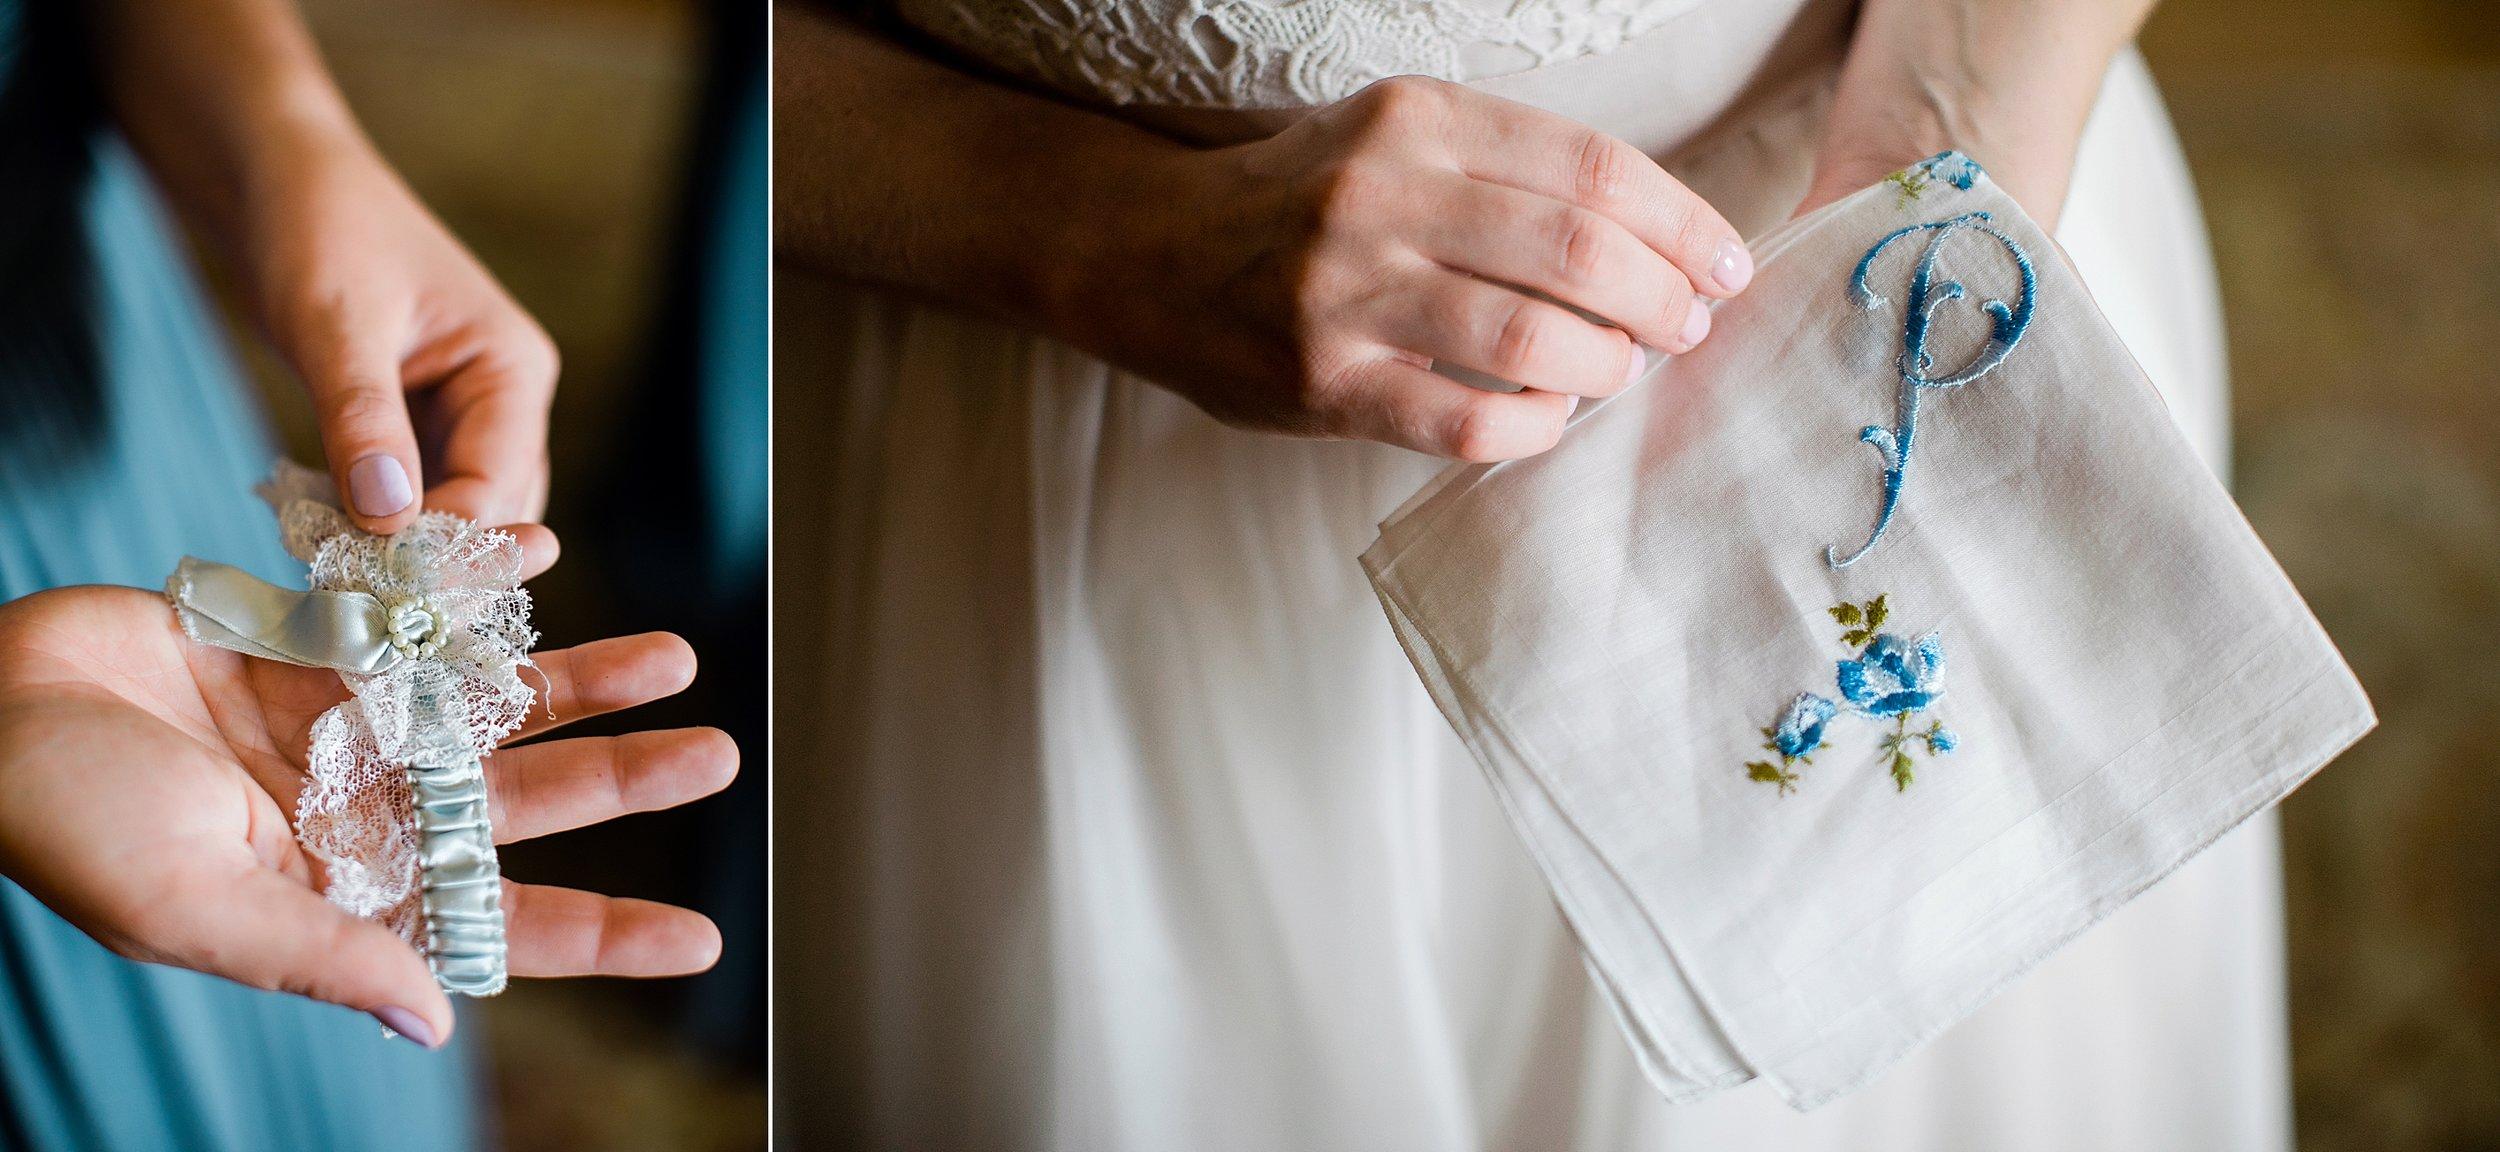 009 los angeles wedding photographer todd danforth photography boston.jpg